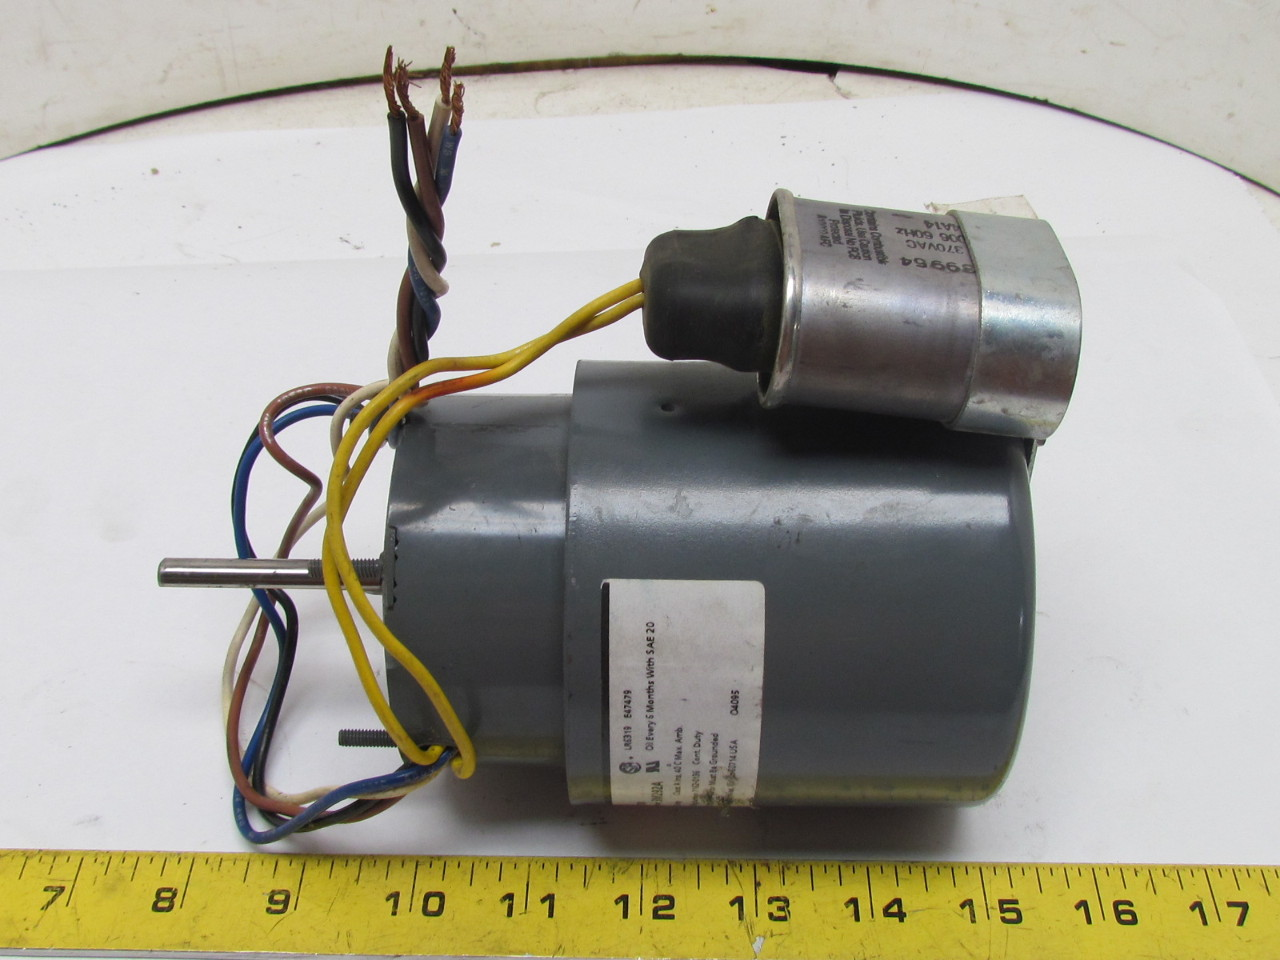 Dayton 3m292a hvac fan blower psc motor 1 8hp 3000 rpm for 1 3 hp psc motor